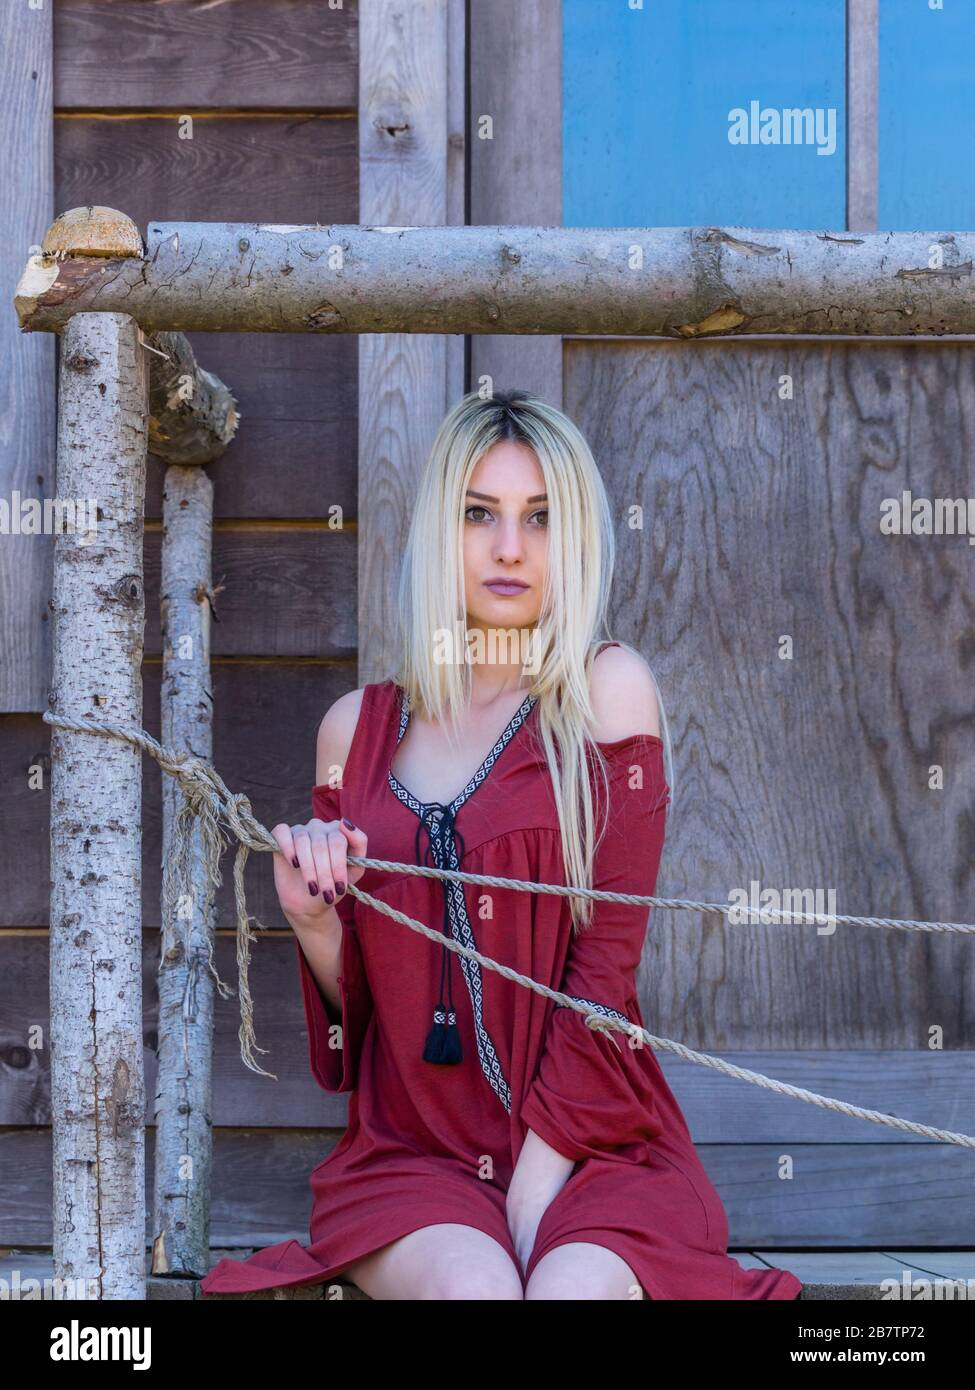 Country-girl countrygirl nostalgia nostalgic feeling Stock Photo